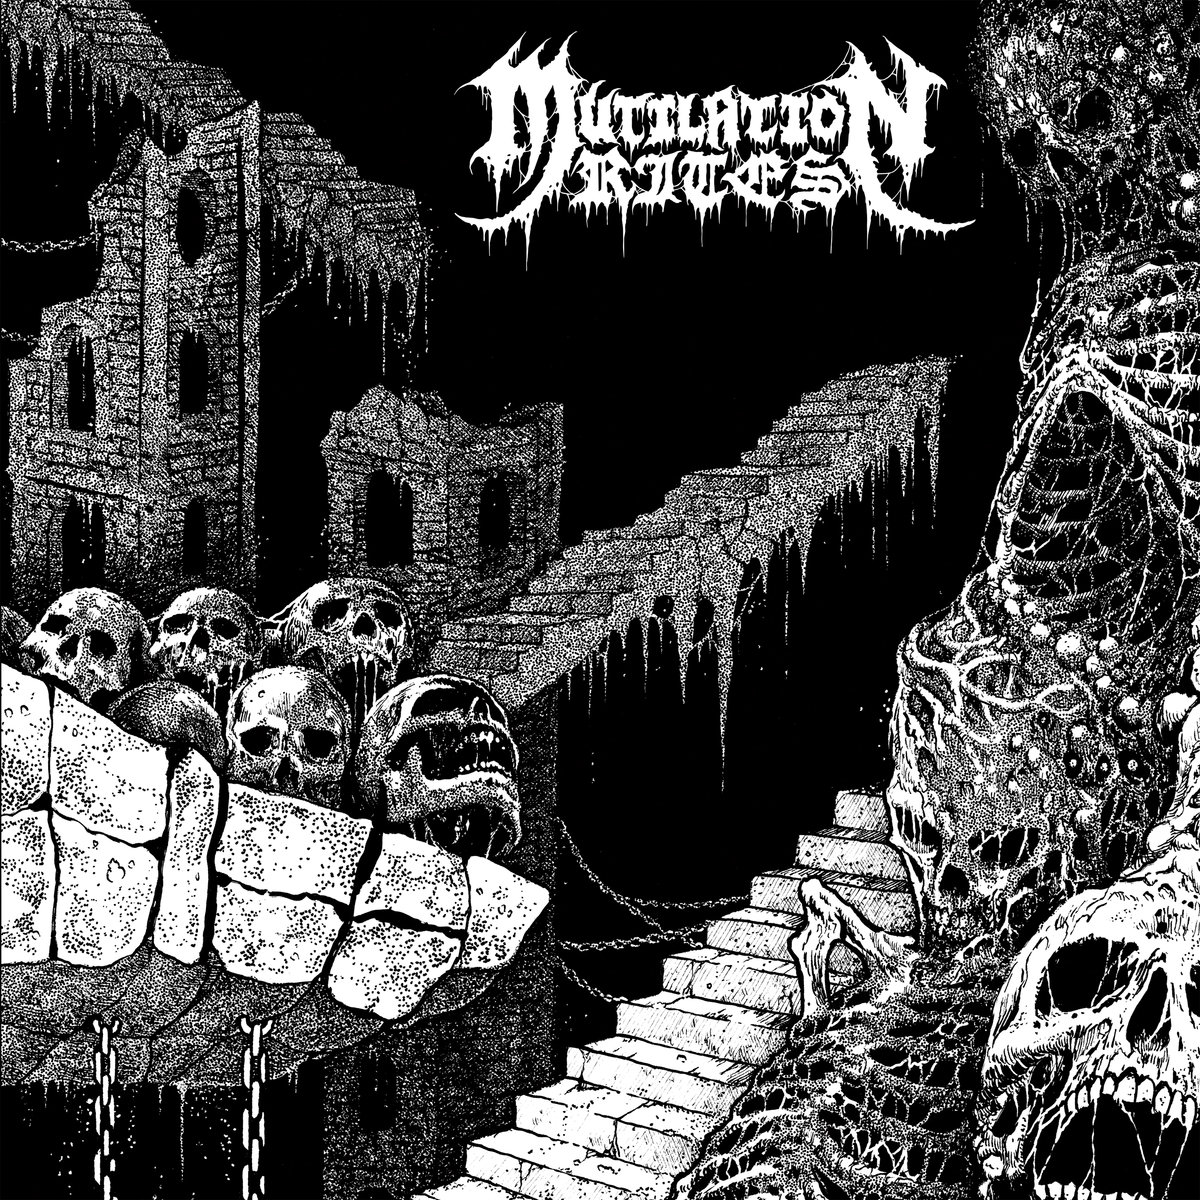 mortuusinsomnis777: Mutilation Rites - Chasm